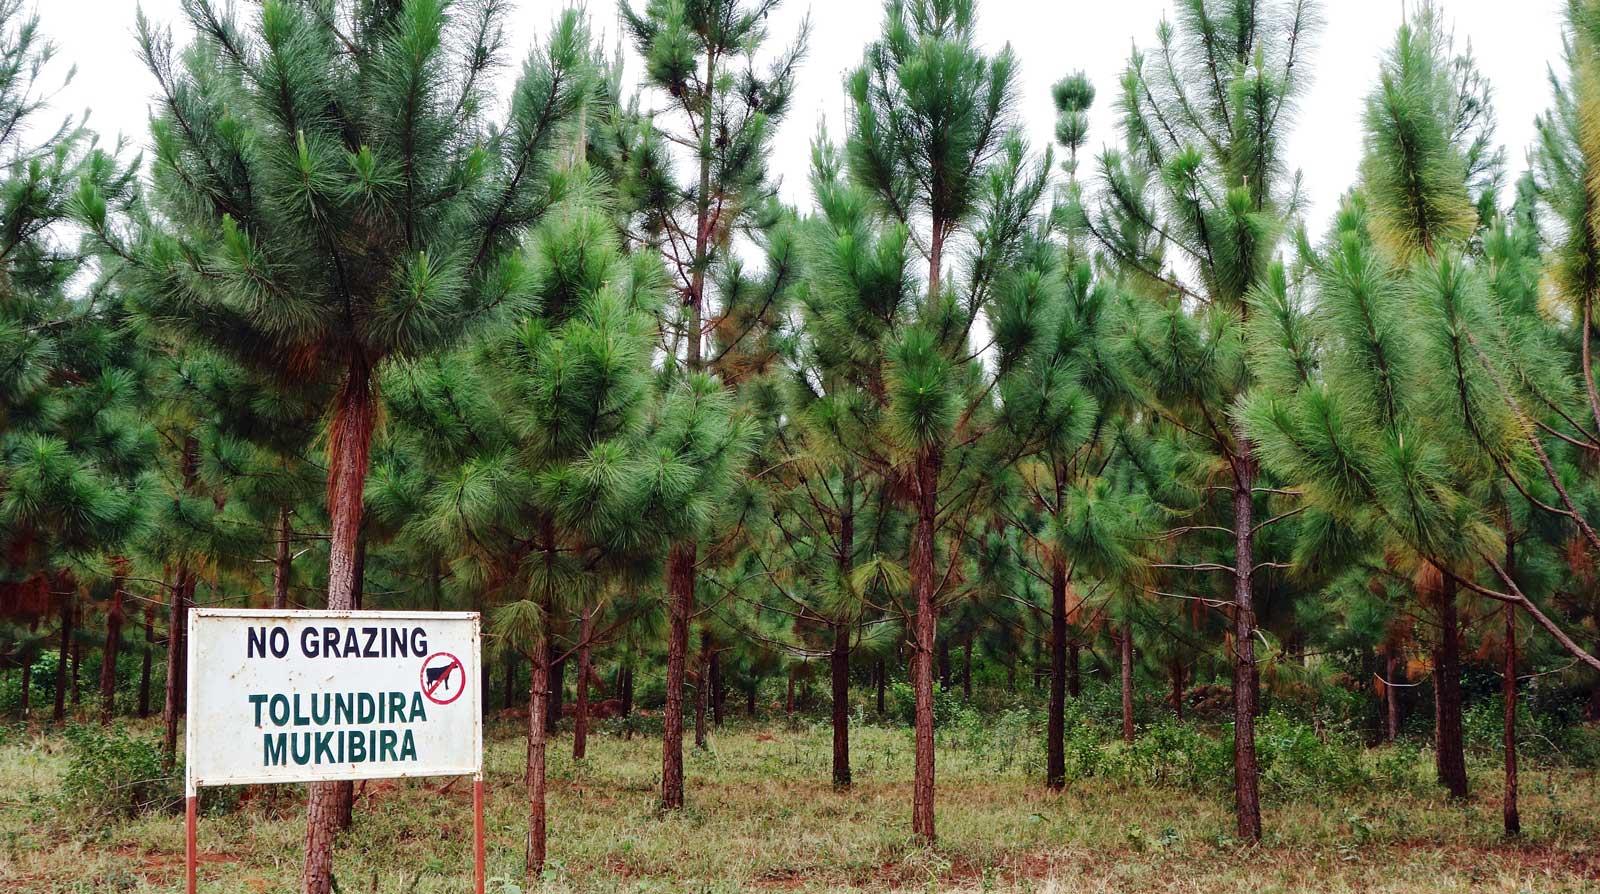 Green Resources' pine plantation at Bukaleba. Credit: Kristen Lyons / The Oakland Institute.